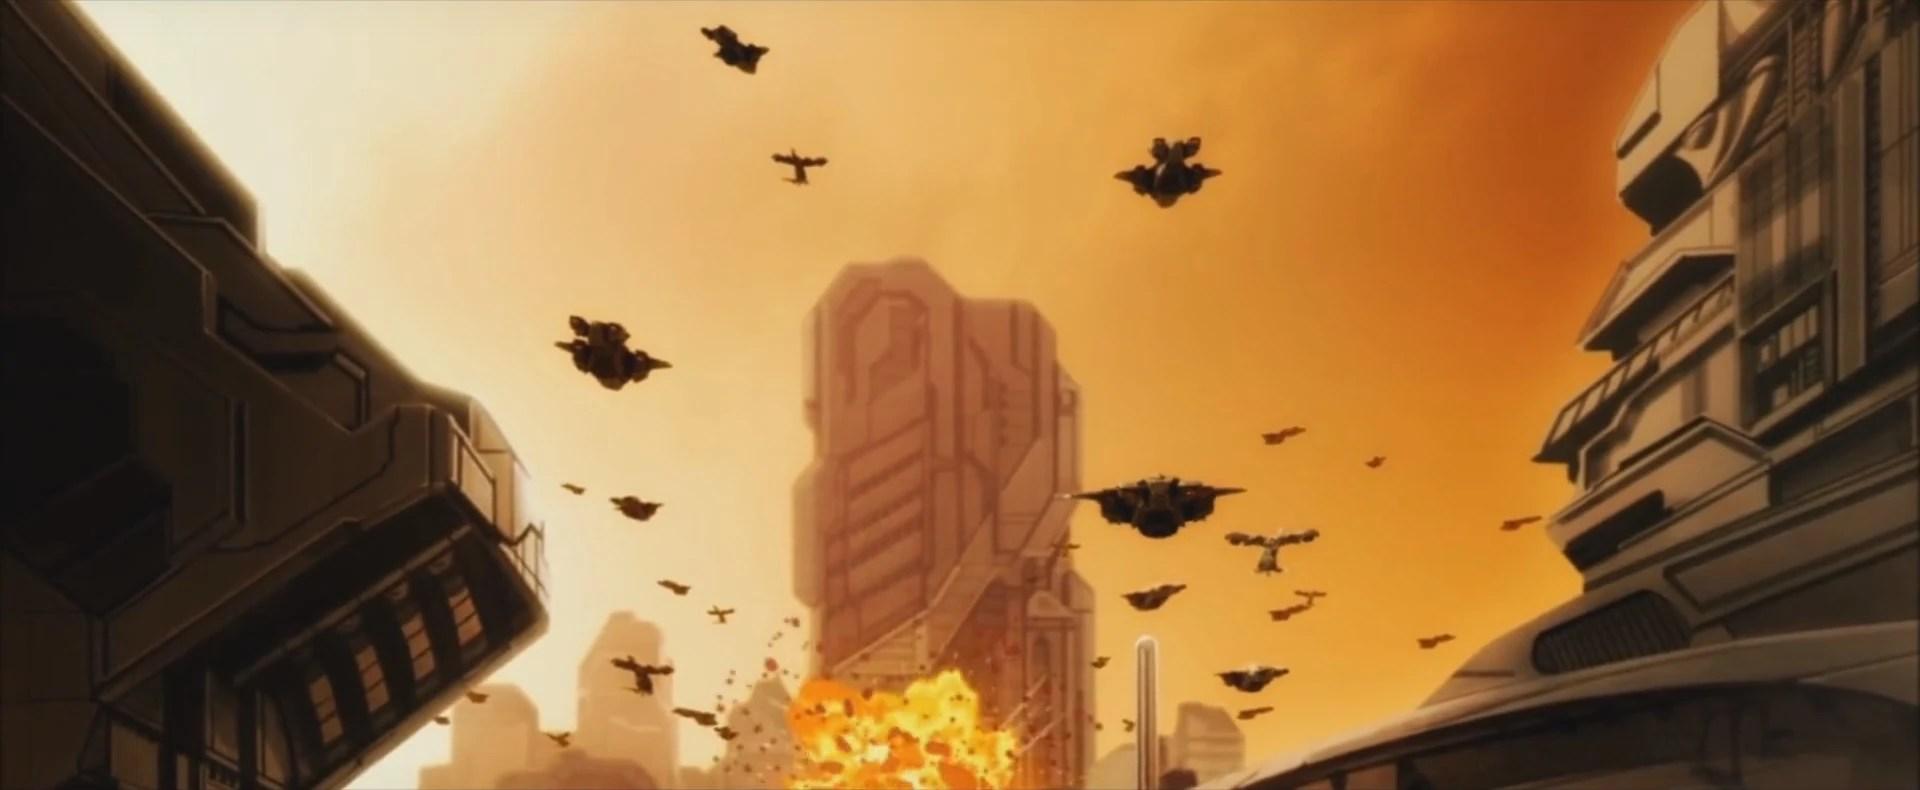 Halo Wallpaper Fall Of Reach Insurrection Halo Nation Fandom Powered By Wikia